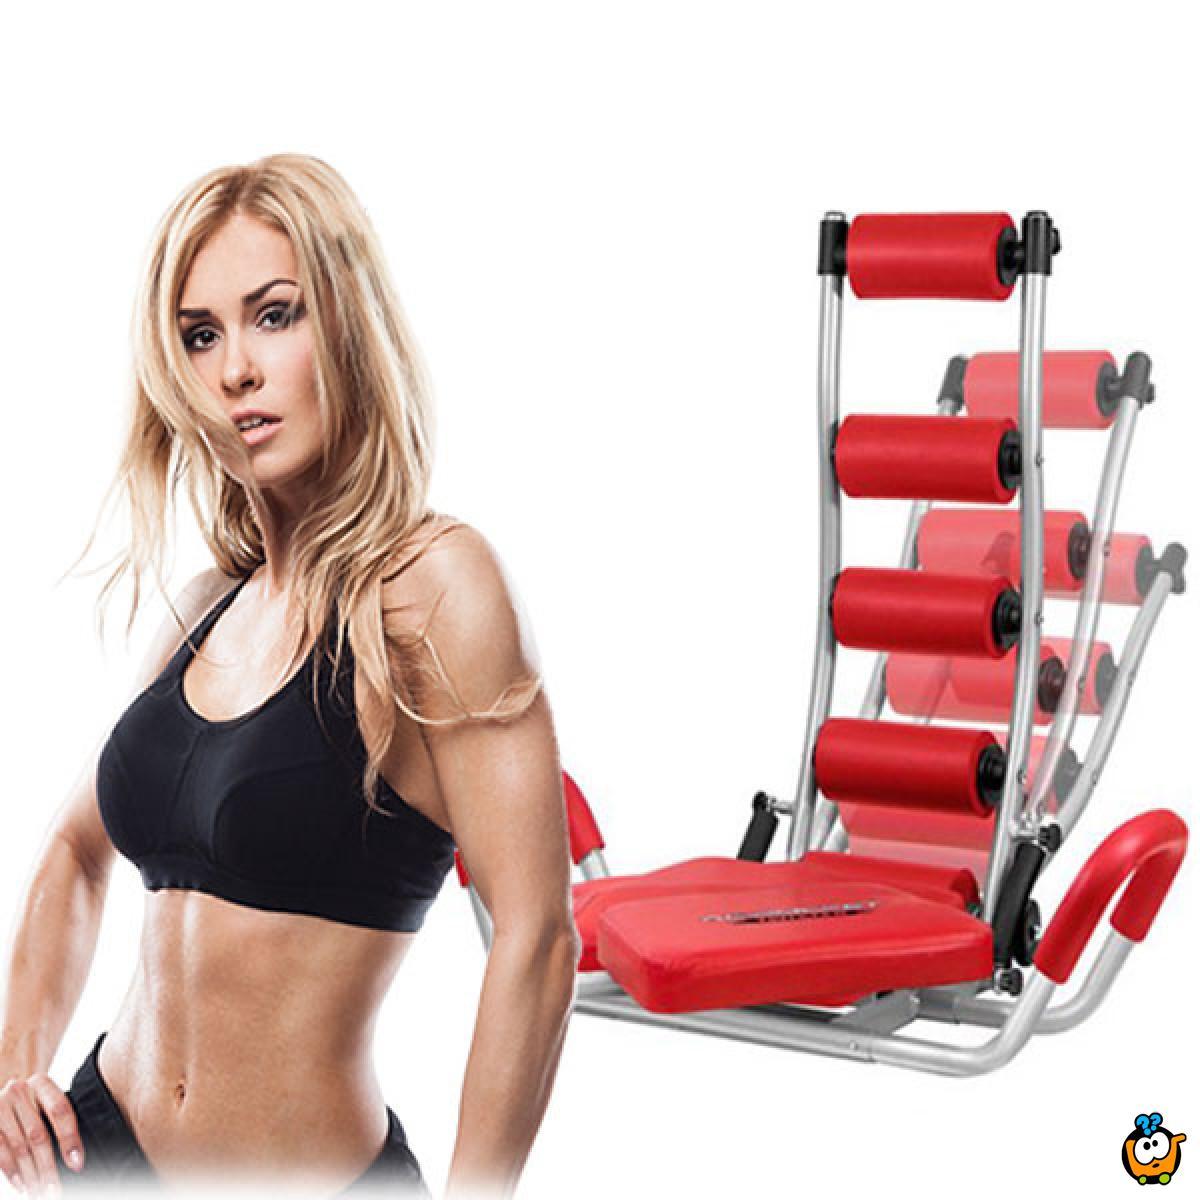 AB Rocket Twister - Sprava za vežbanje i oblikovanje stomaka